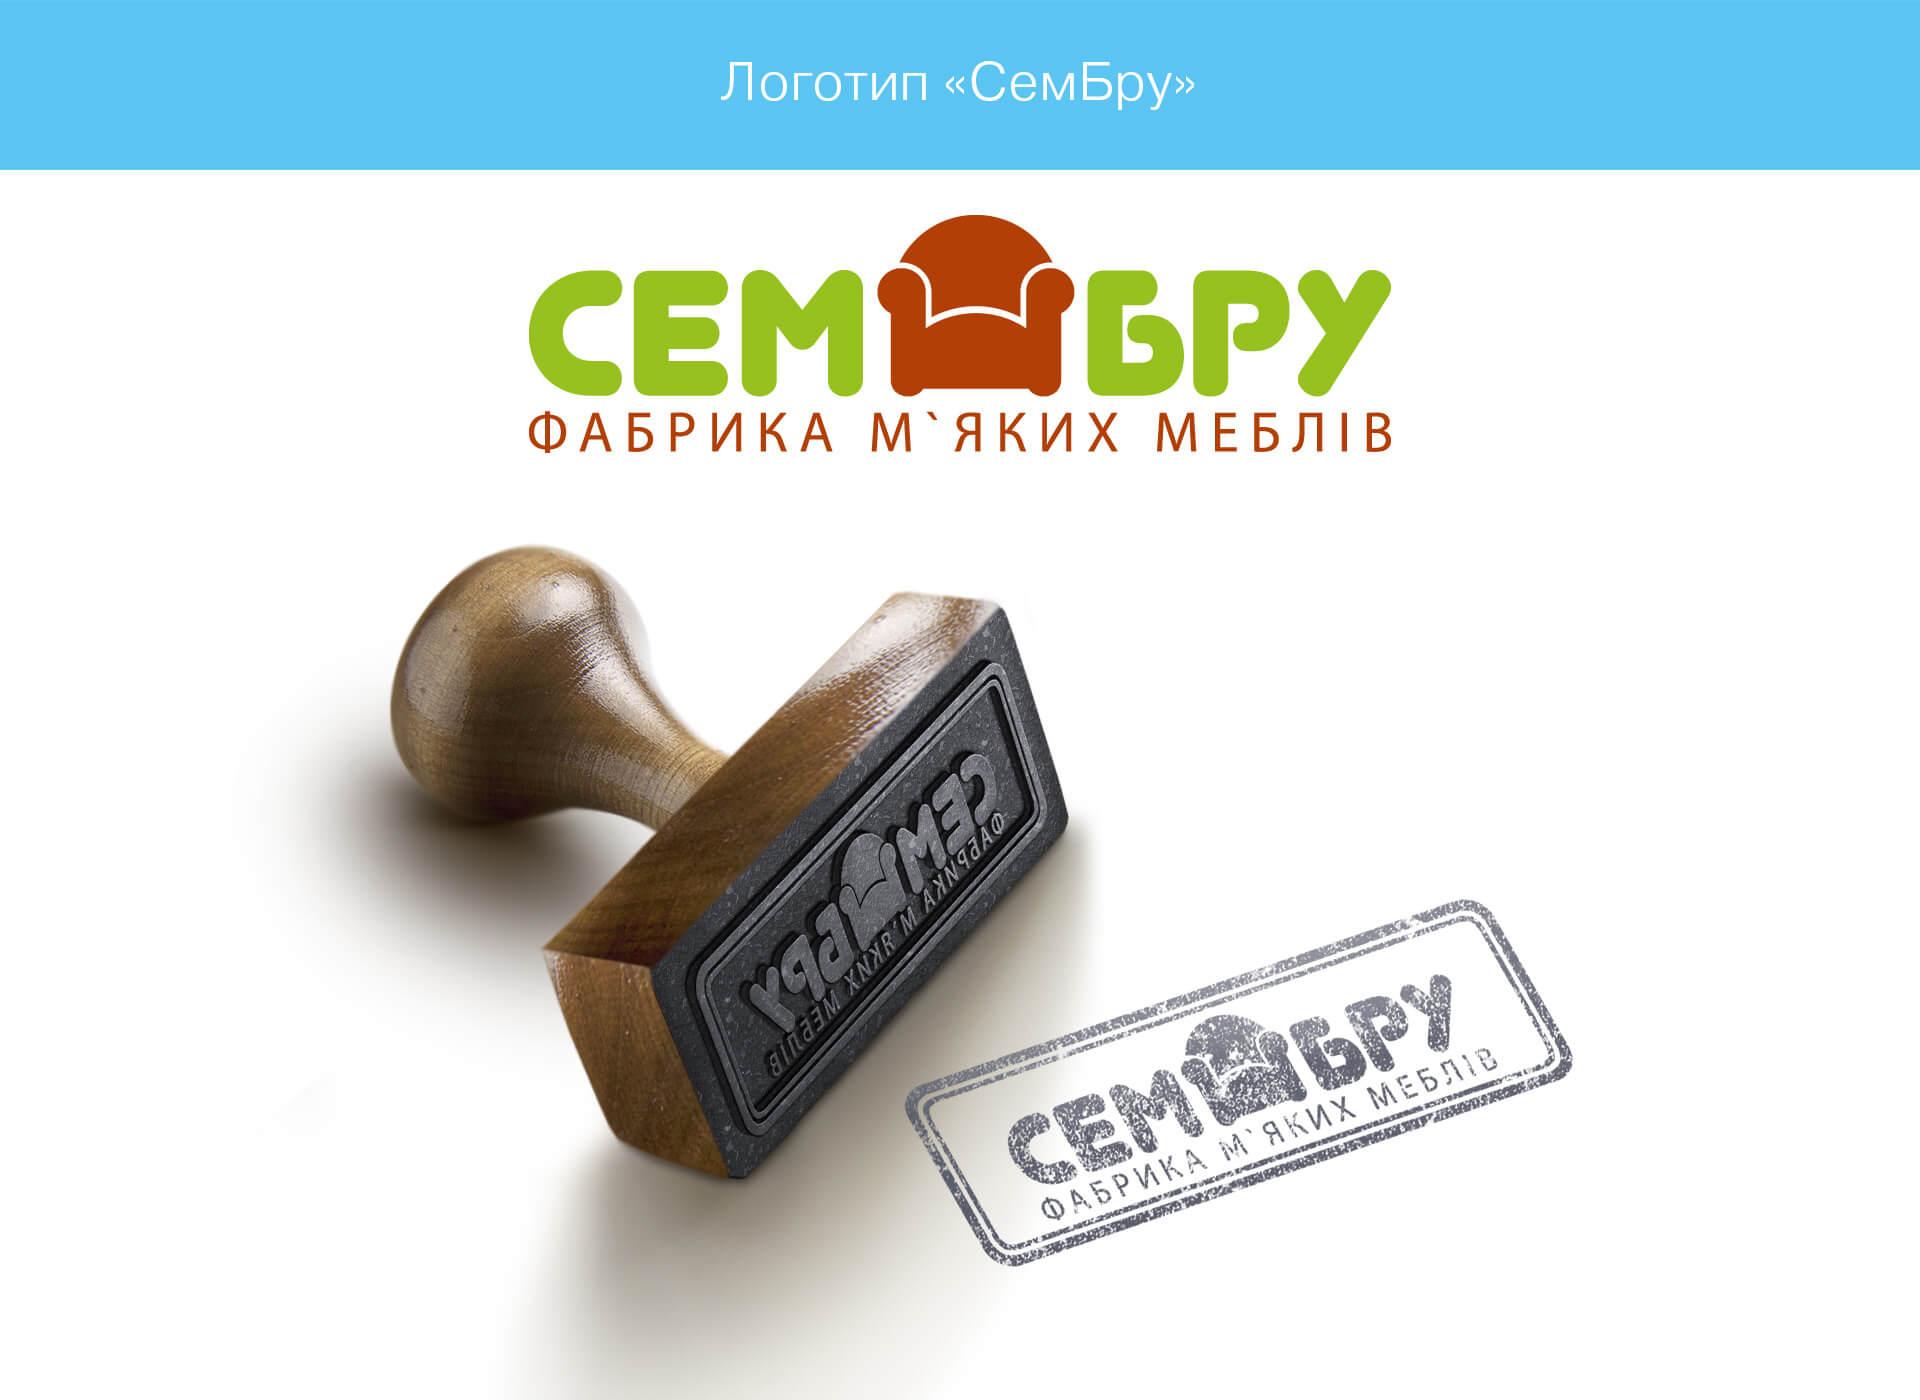 prokochuk_irina_logo_website-design_sembru_1